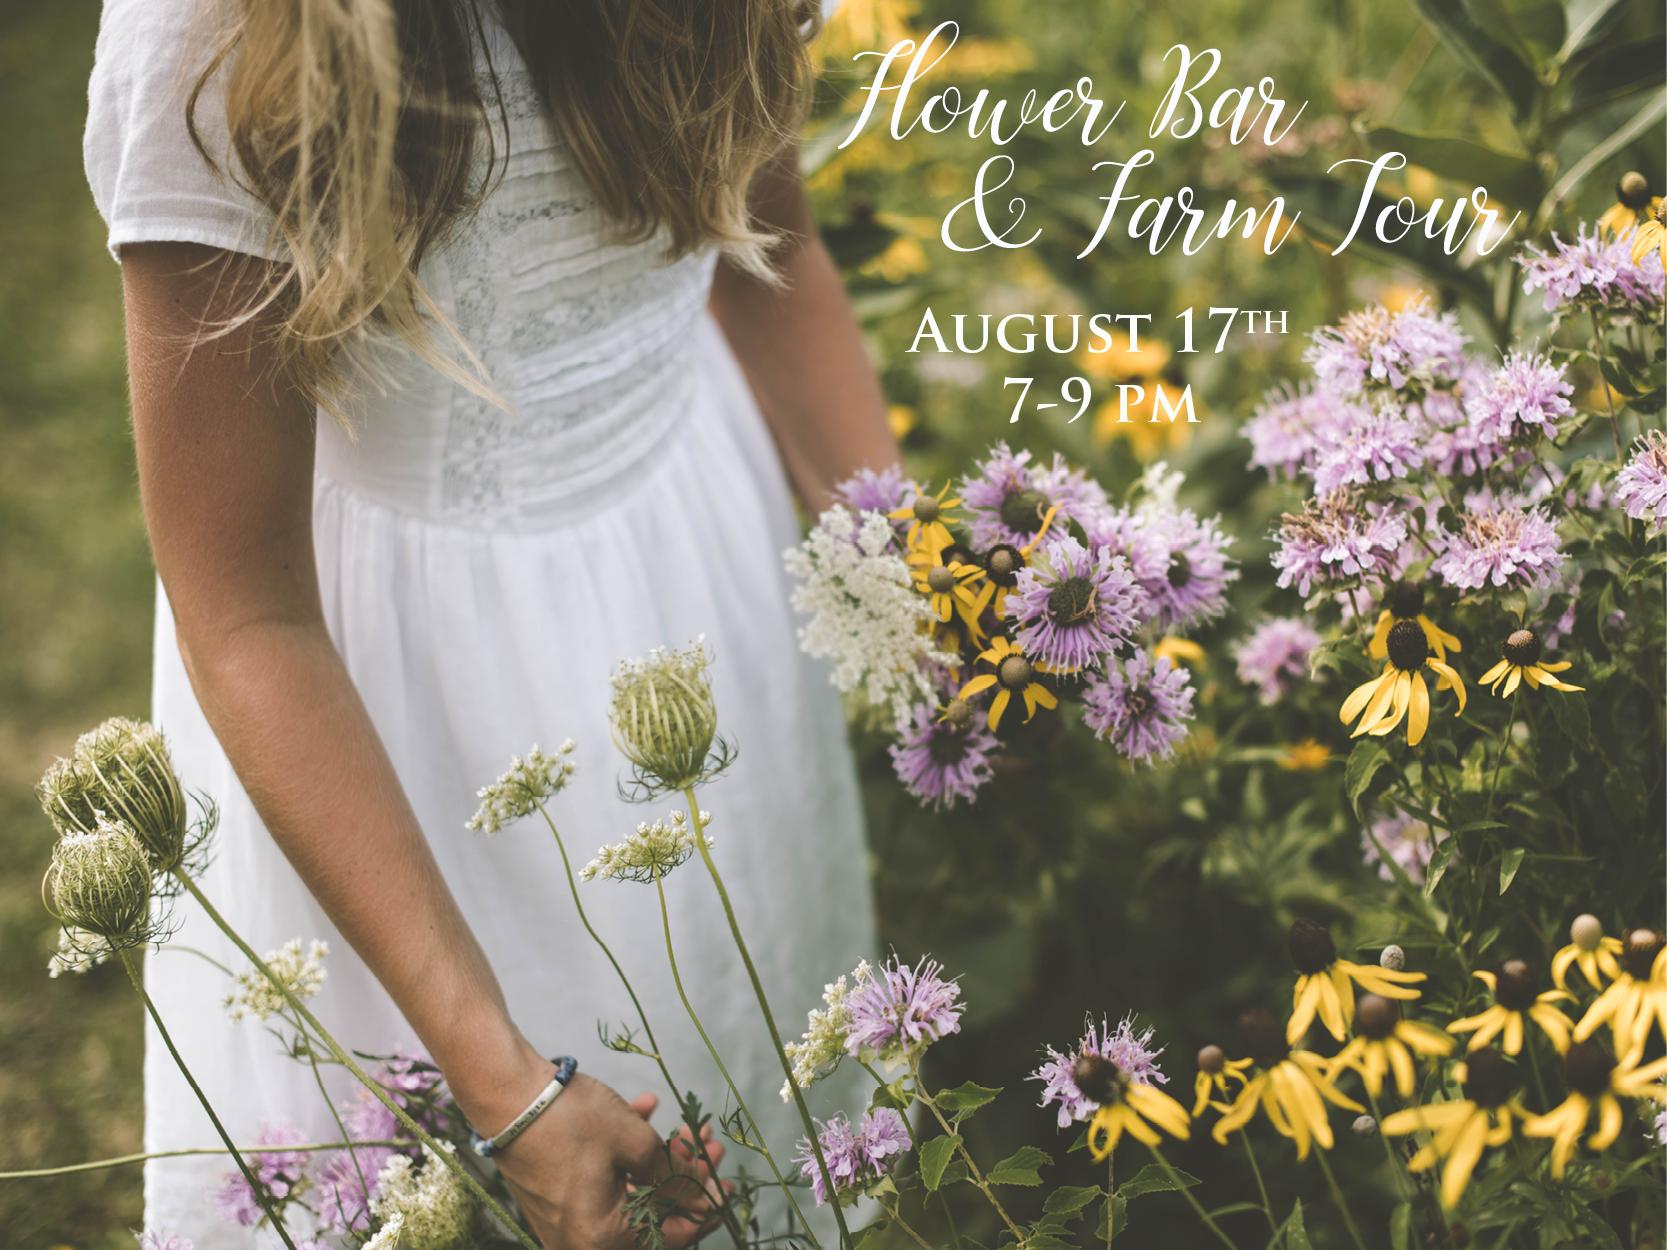 August 2018 Flower Bar & Farm Tour